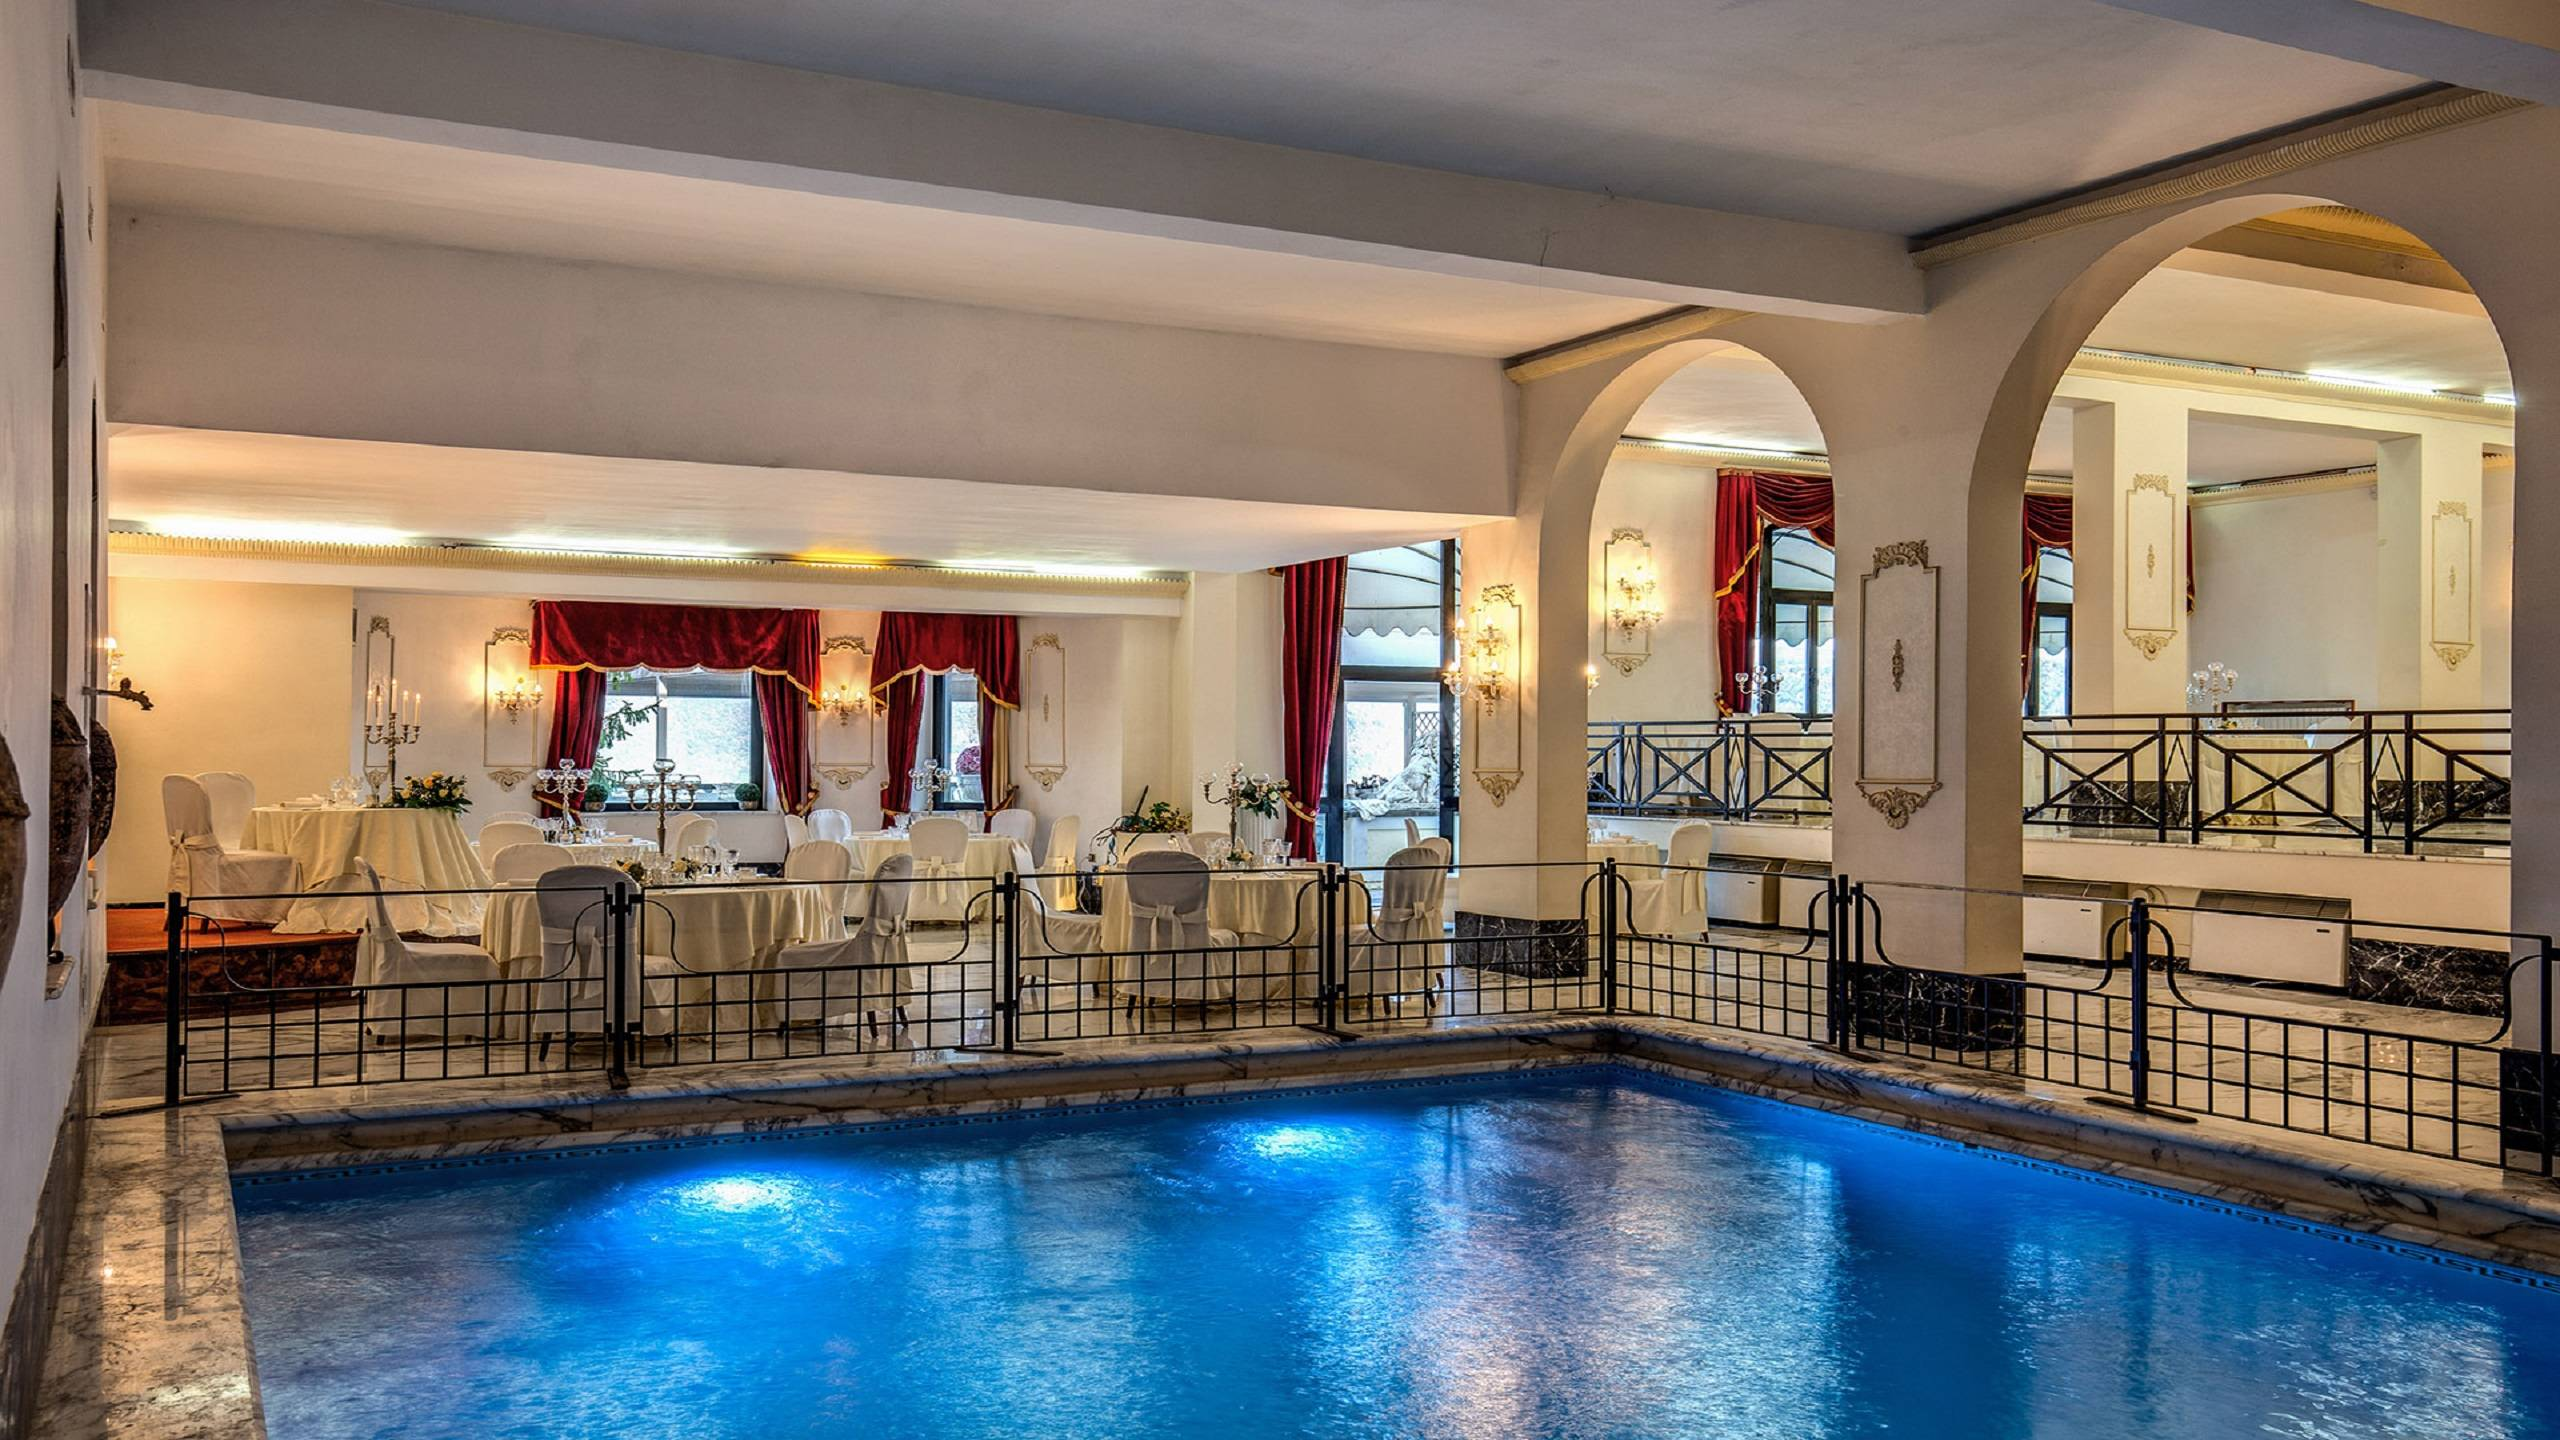 Hotel-Castel-Vecchio-Piscina-Interna-Sala-Domiziana-Tavolo-Sposi